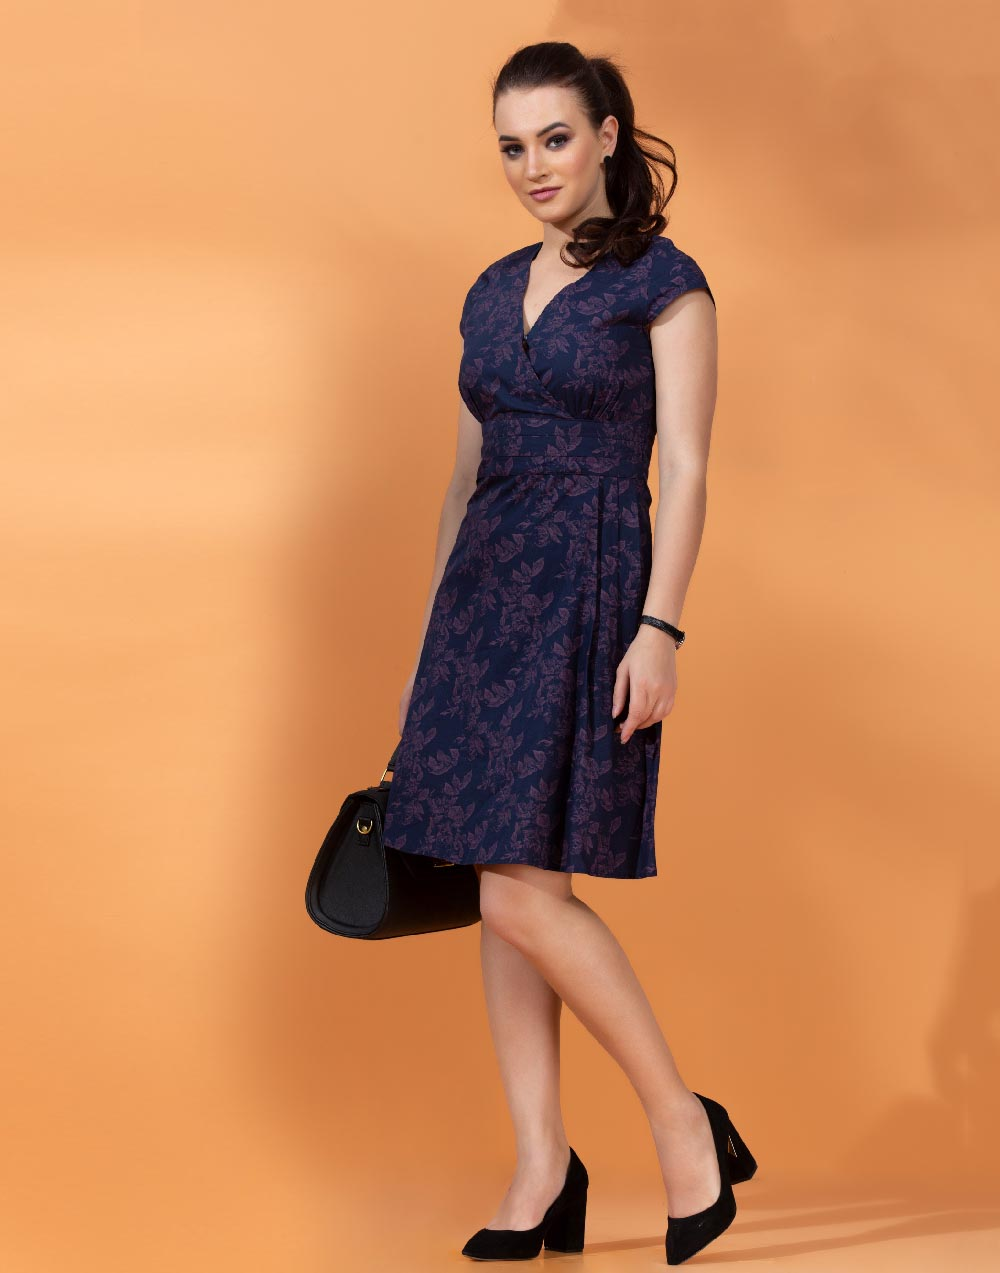 One of the girl WW dress